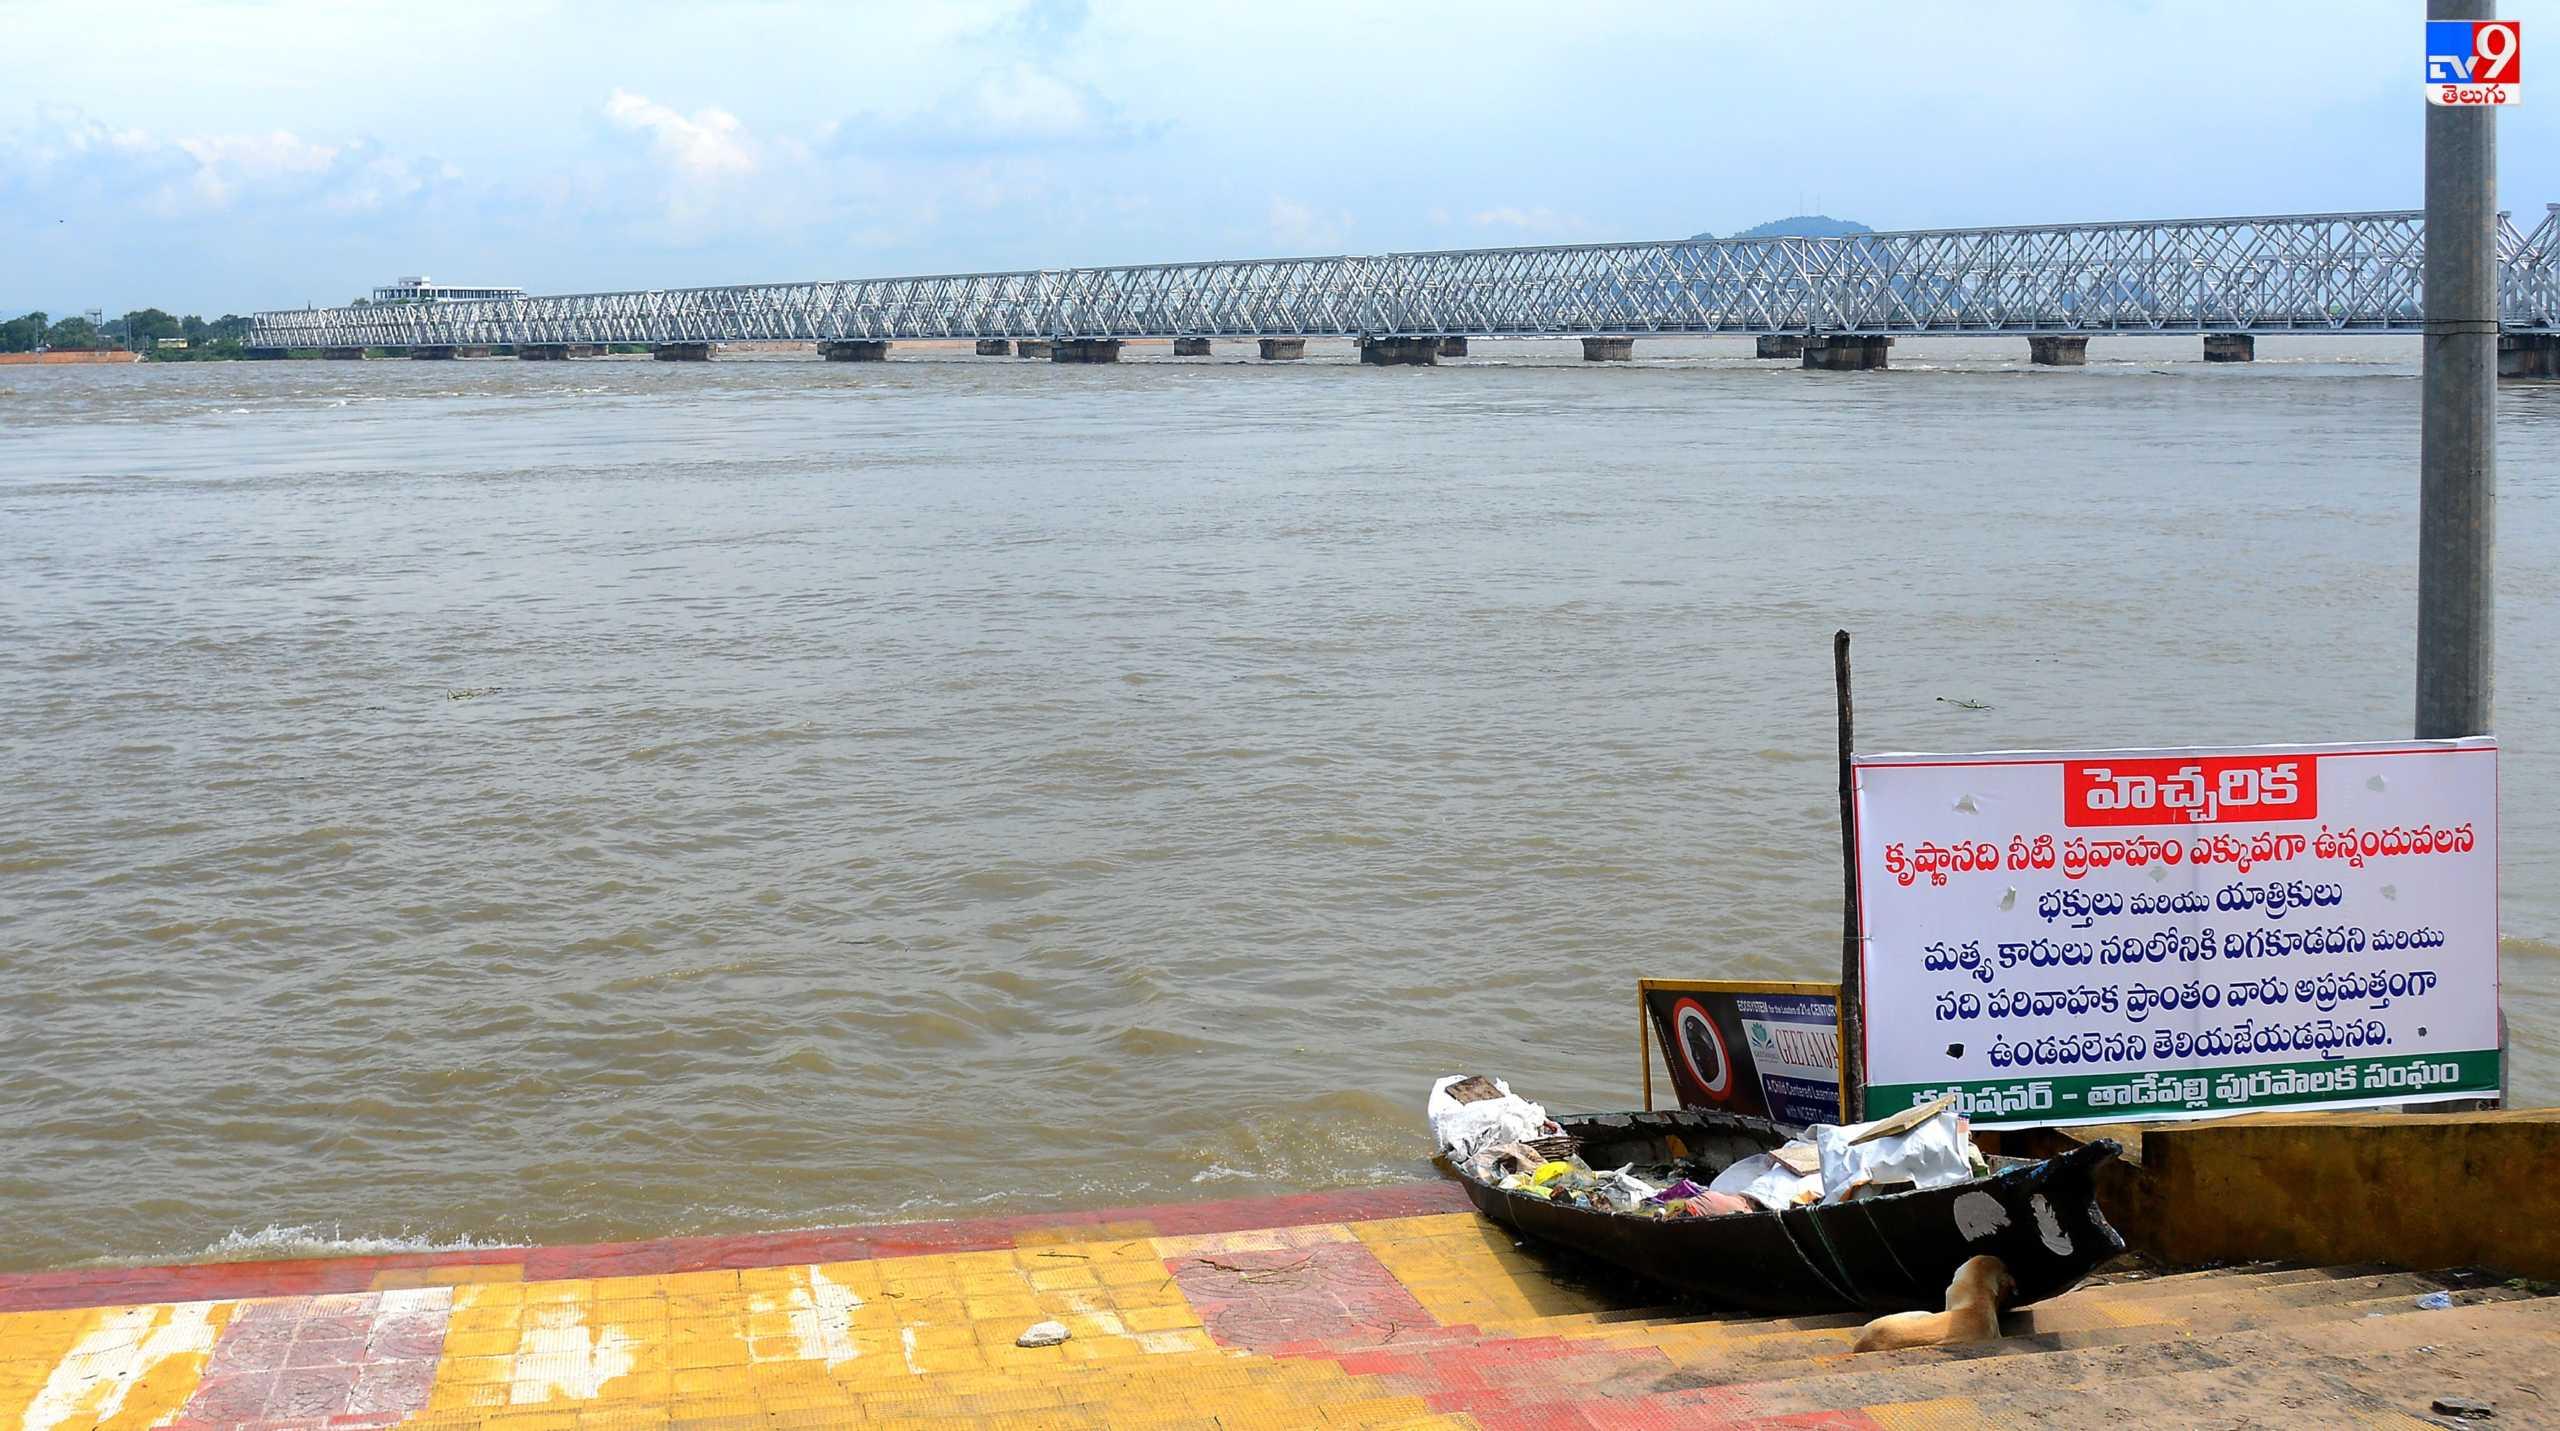 Prakasam Barrage, కృష్ణమ్మ మహోగ్రరూపం దాల్చింది